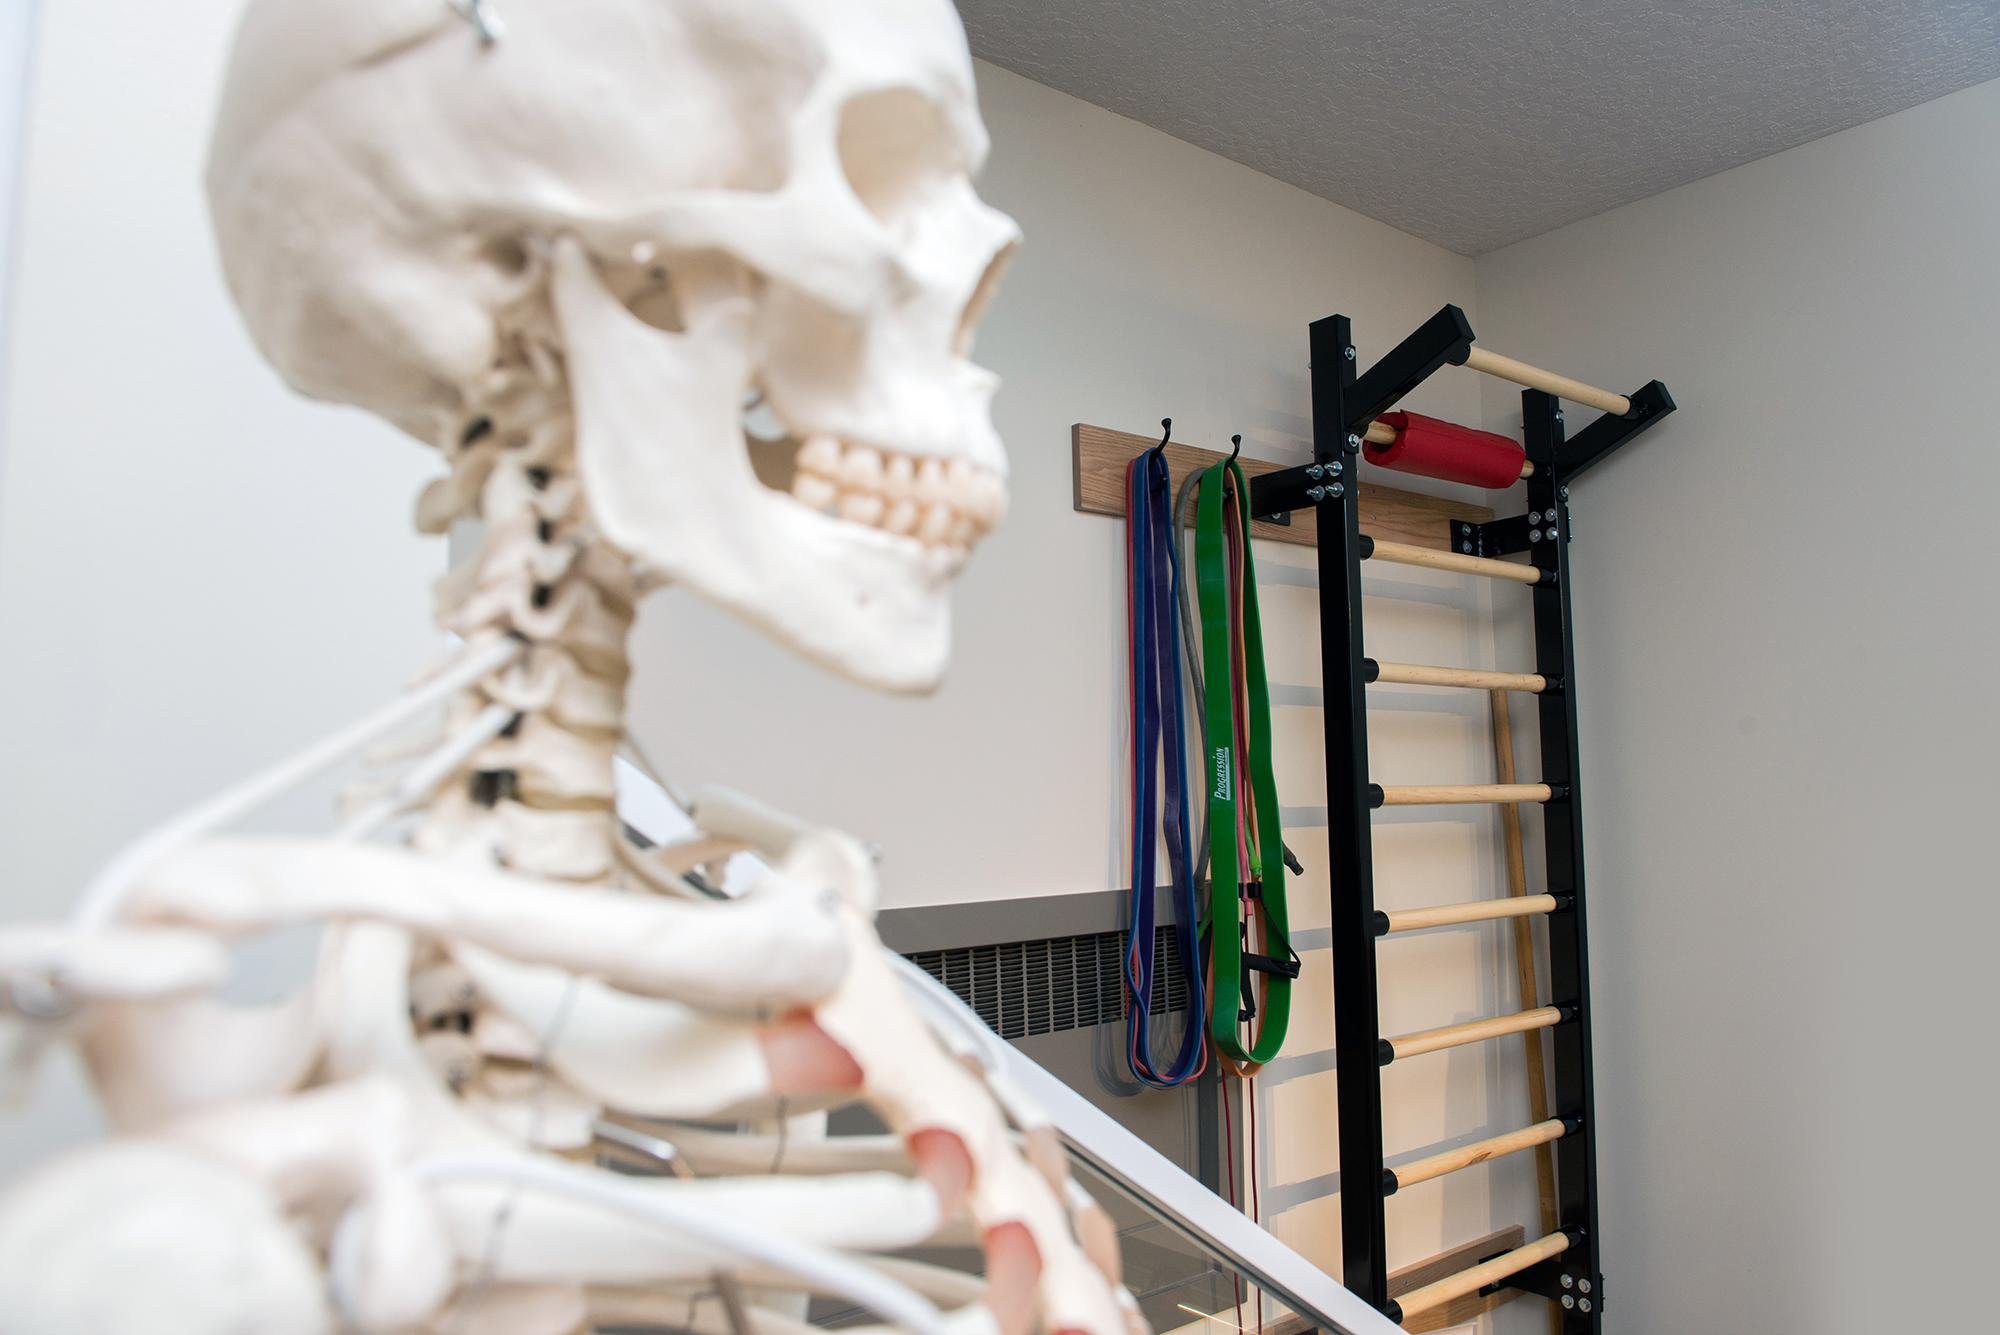 skeleton and gym